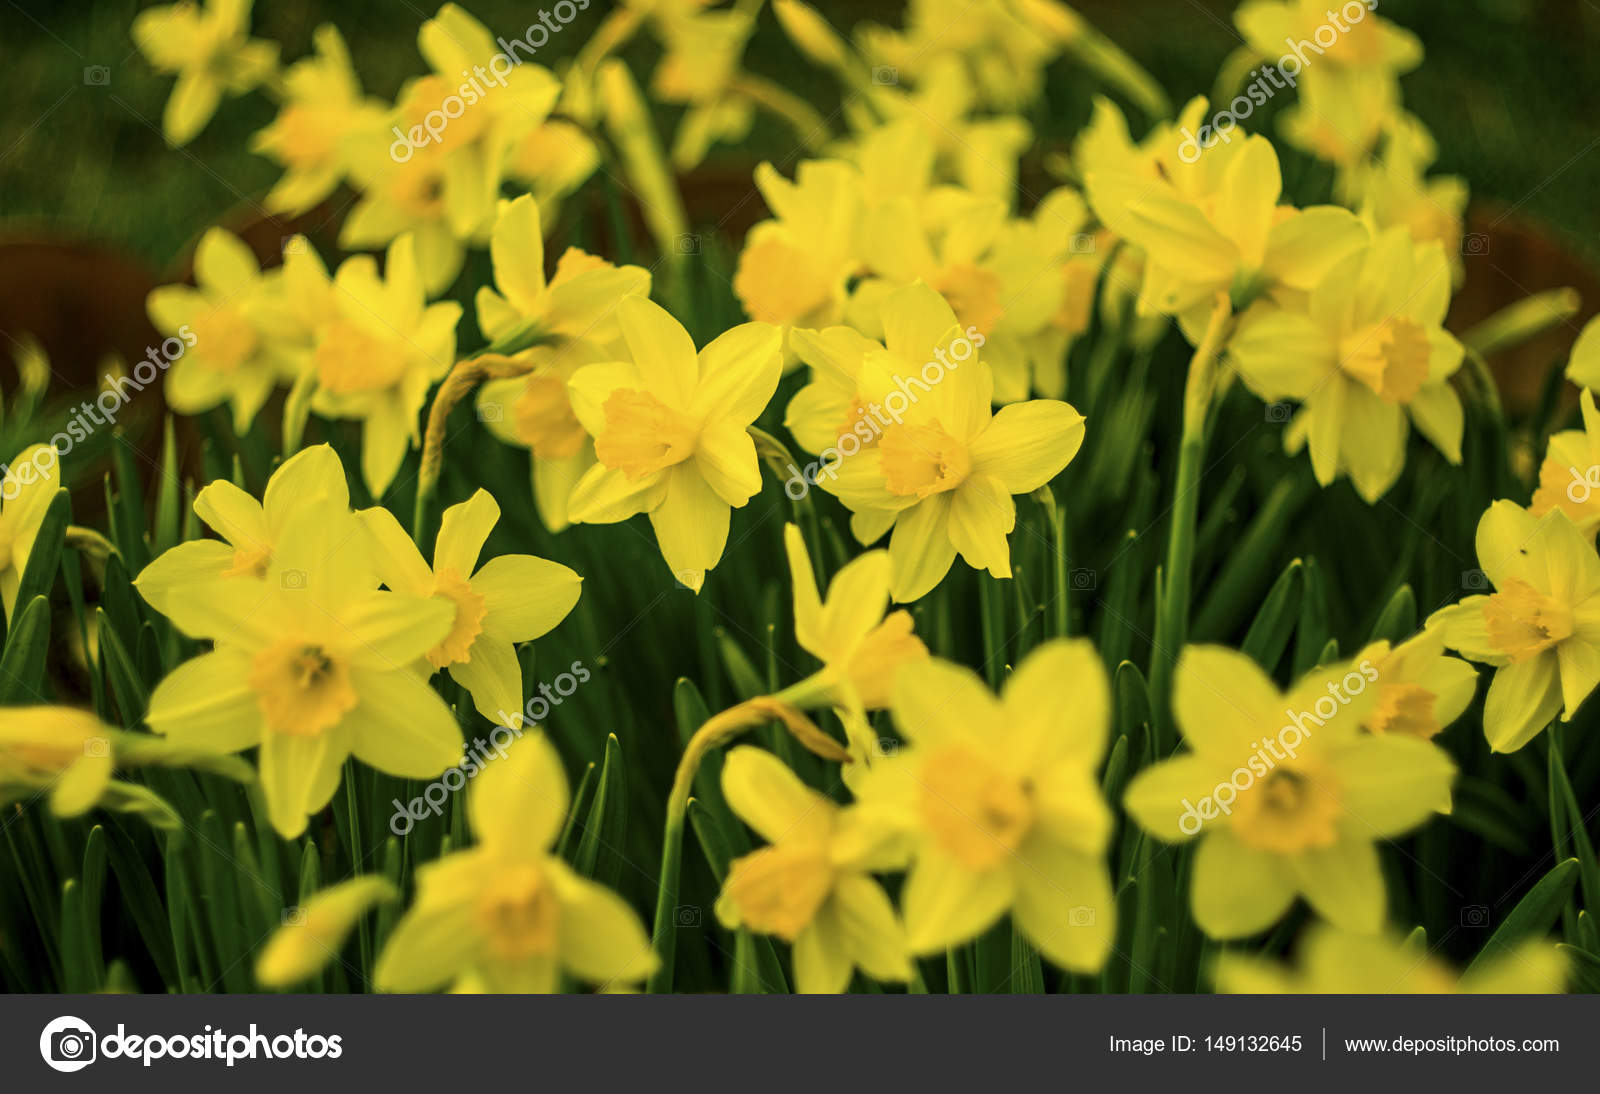 Jonquilles Fleurs De Jonquilles Fleur Jonquille Jaune Dans La F